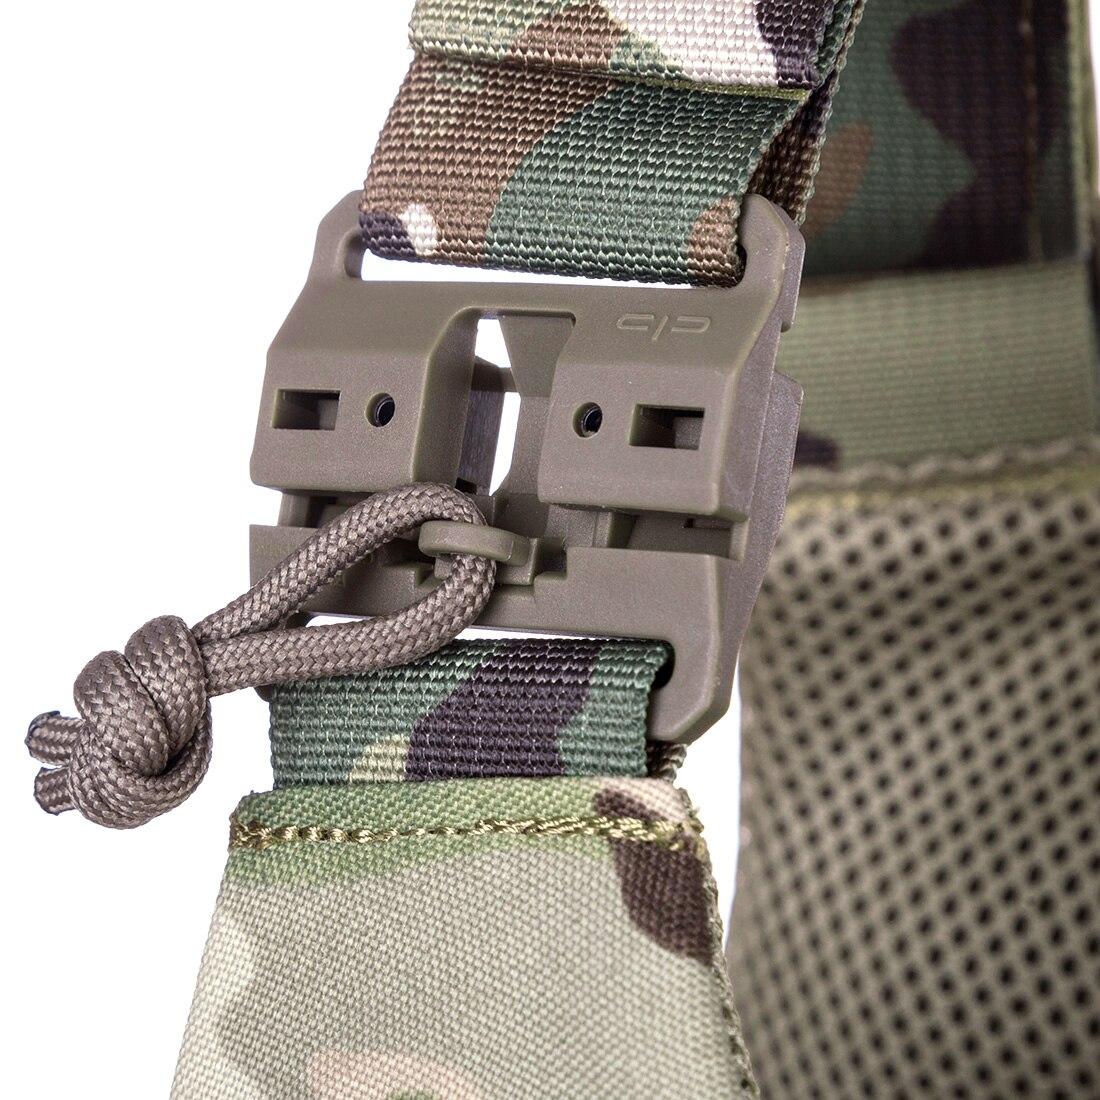 Dmgear fivela magnética placa transportadora caça tático